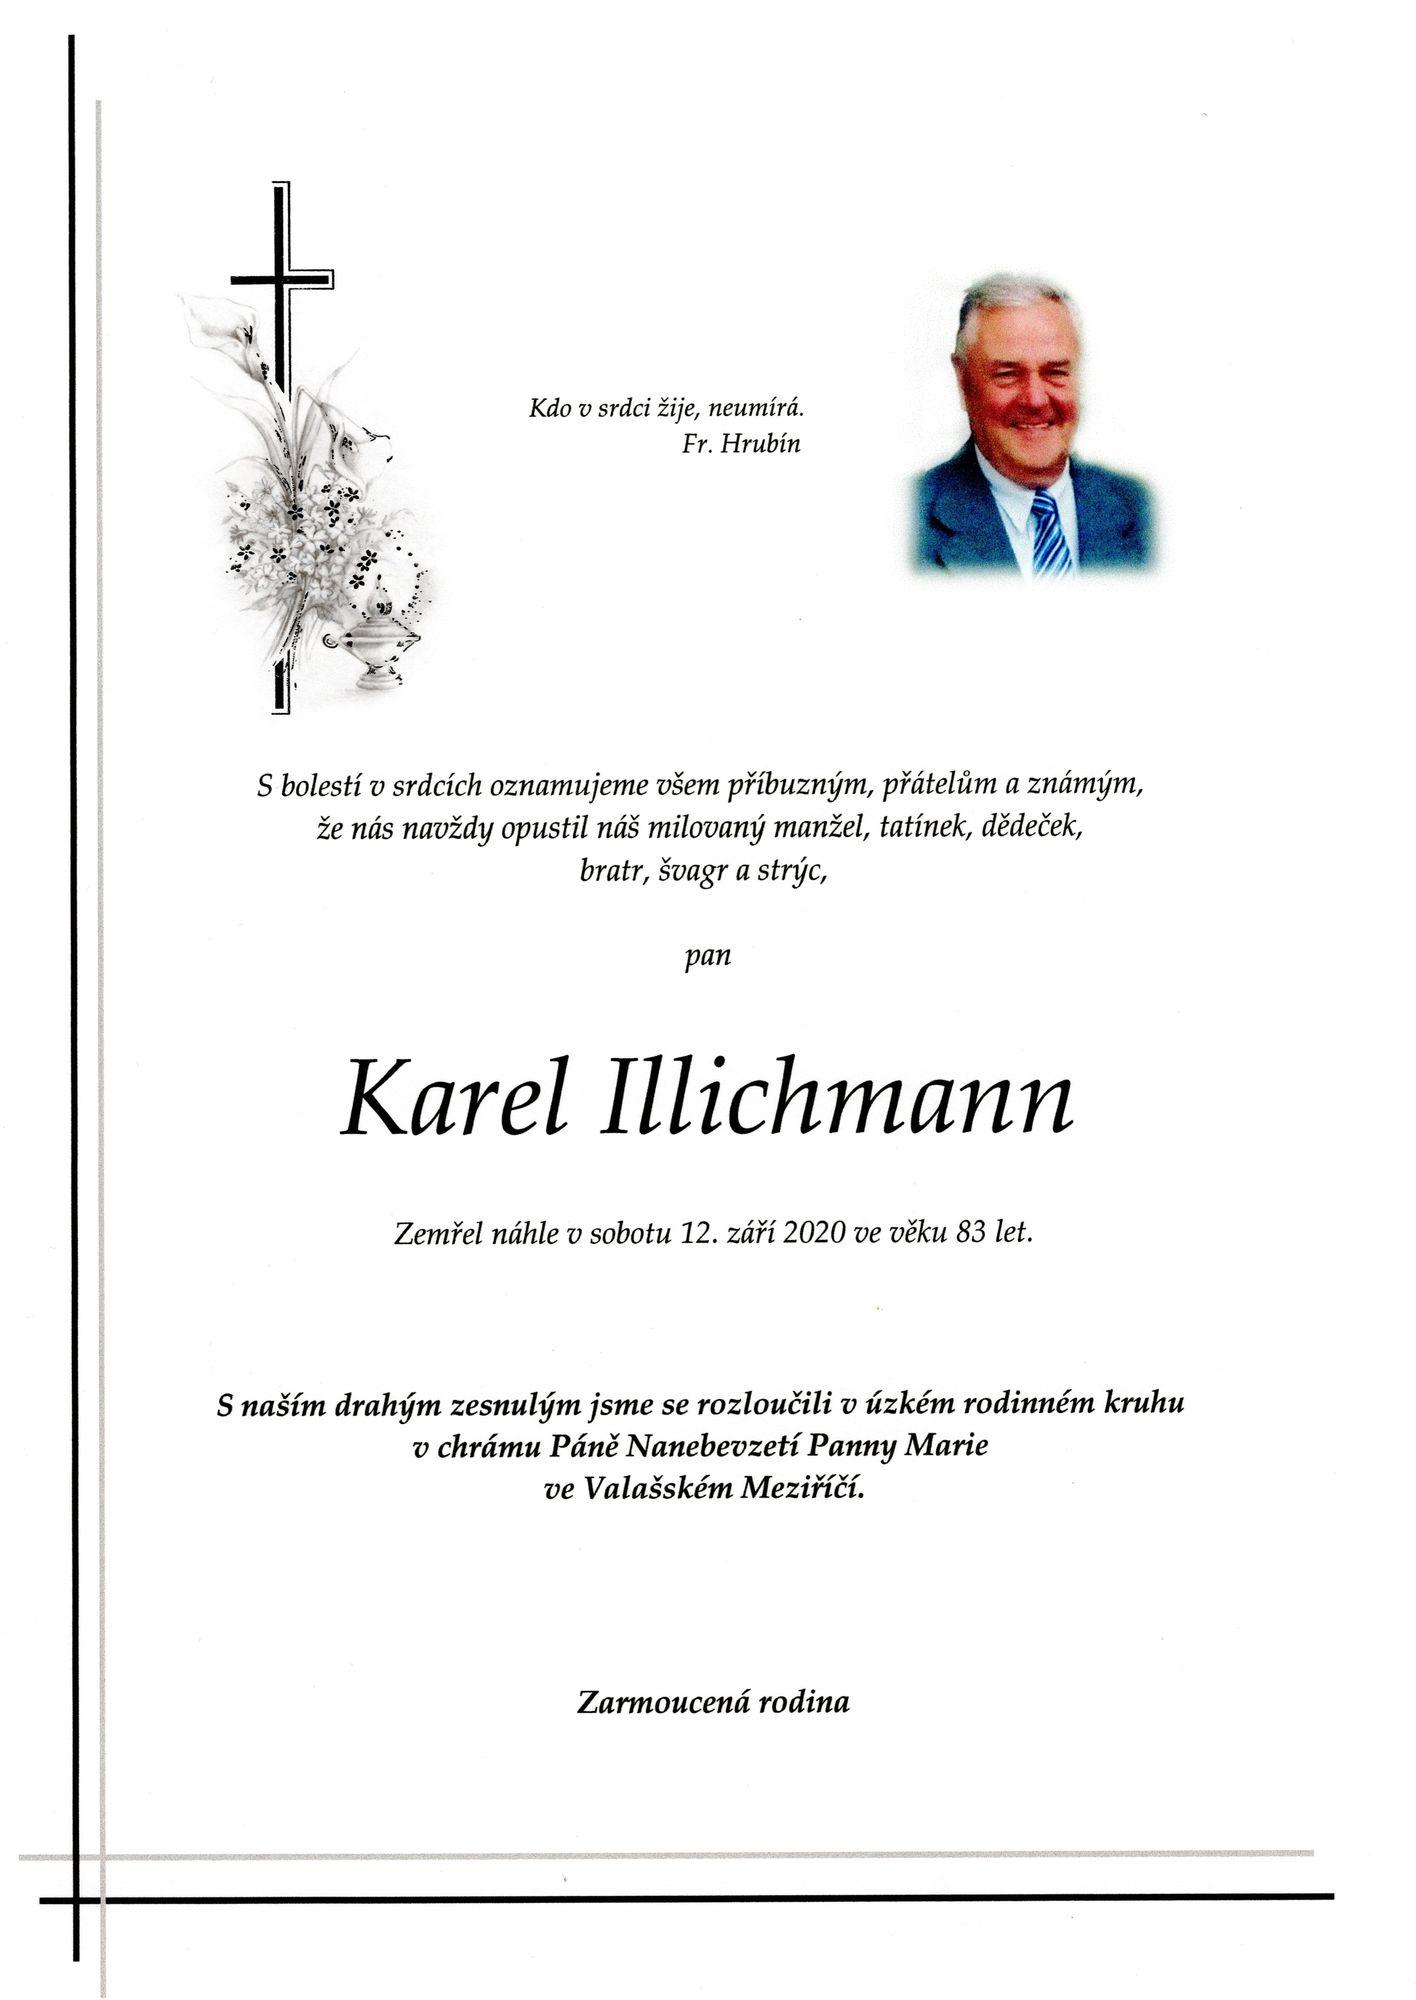 Karel Illichmann